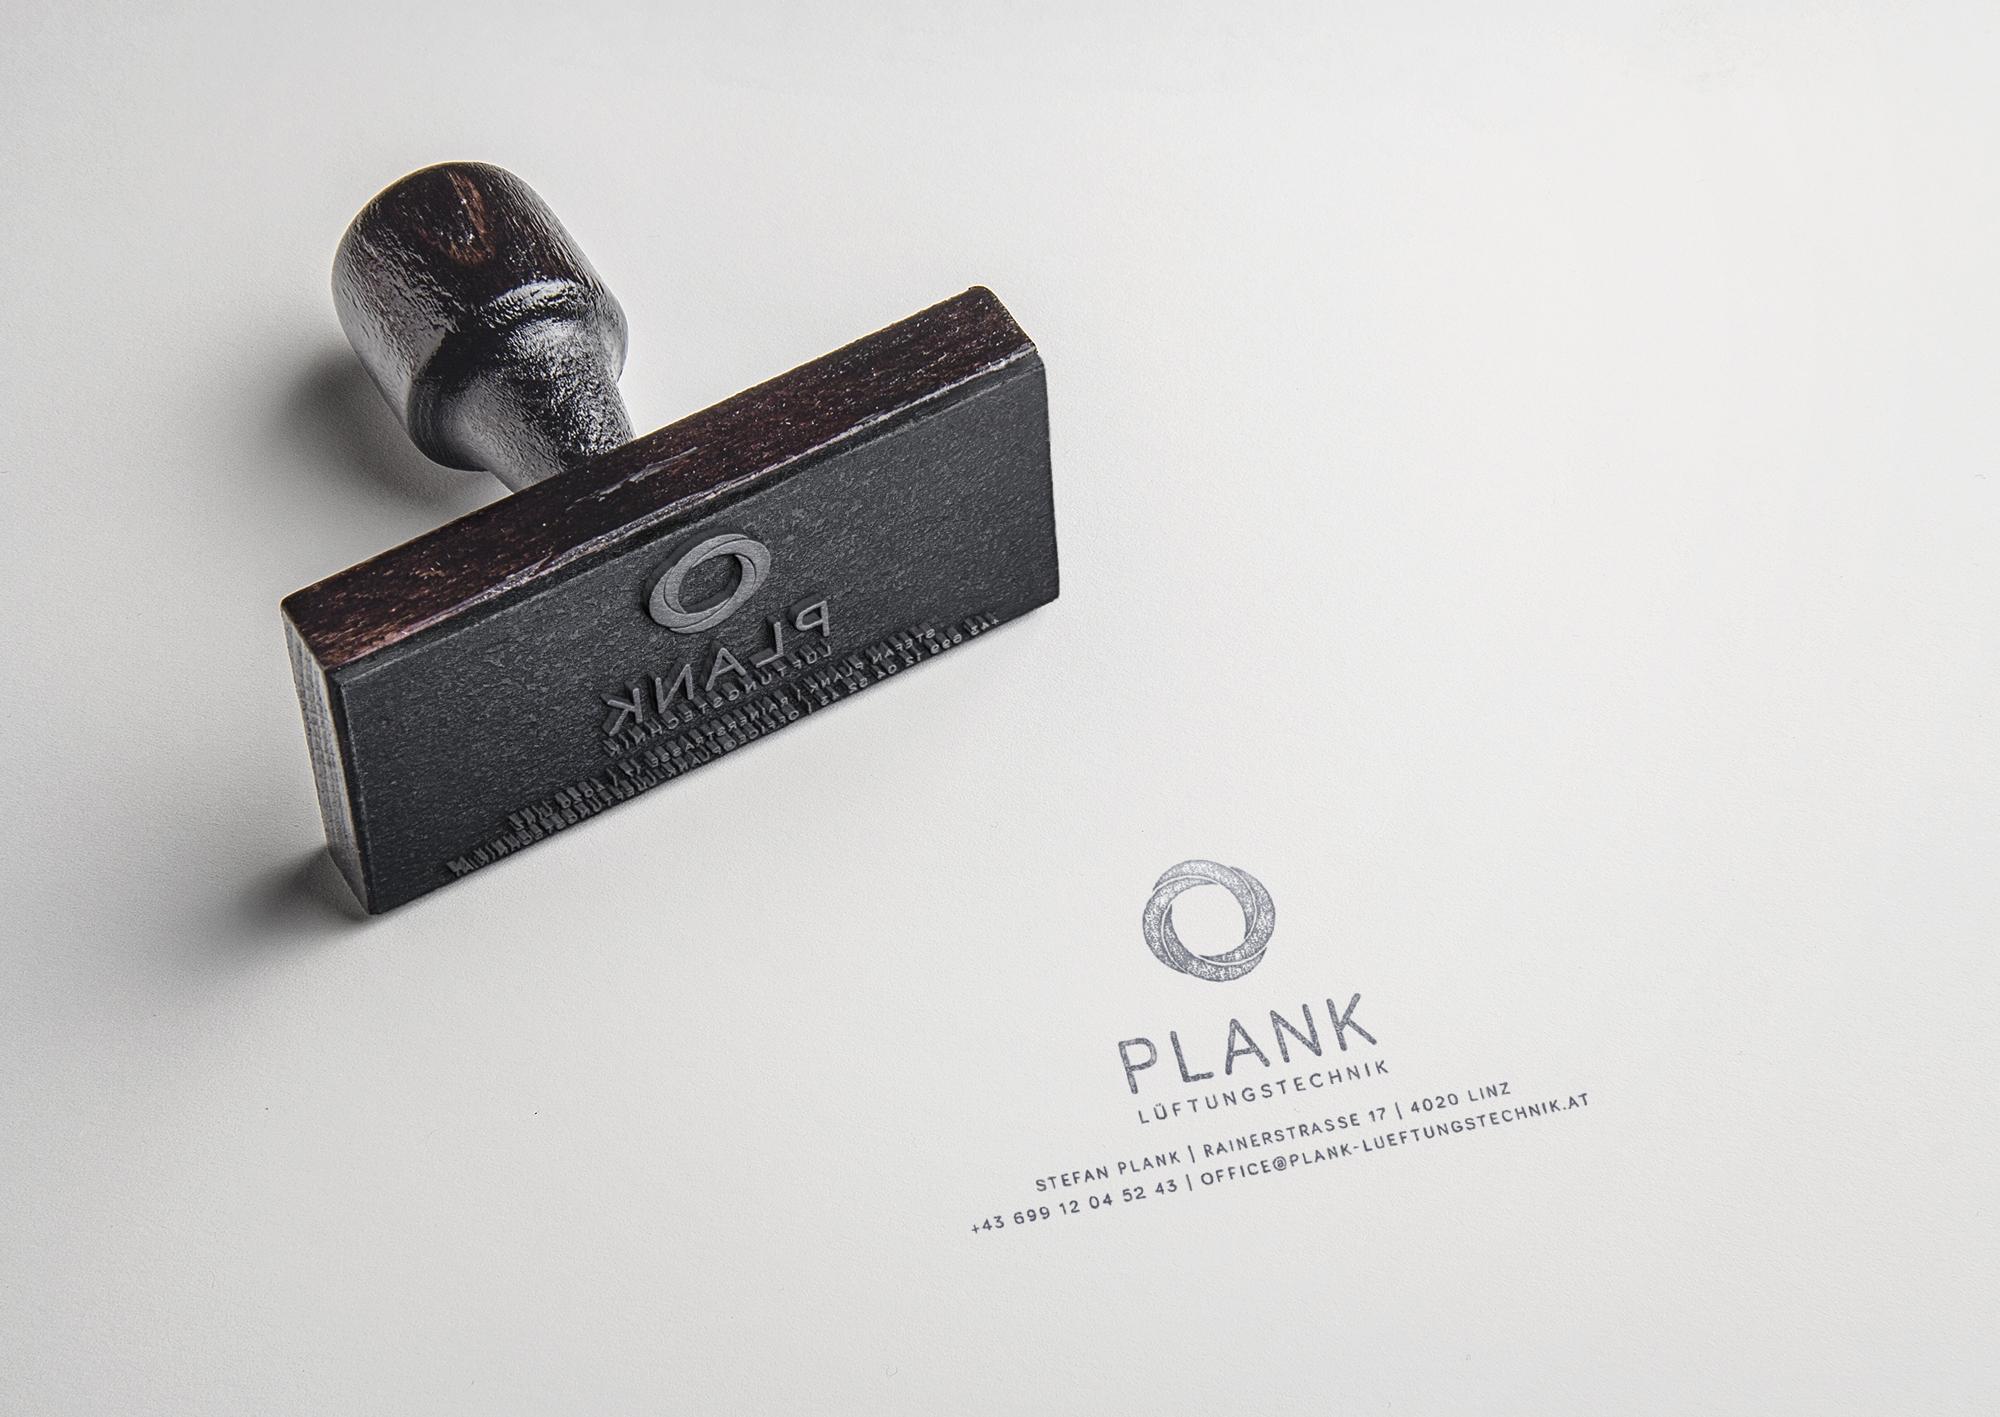 Plank_Stamp